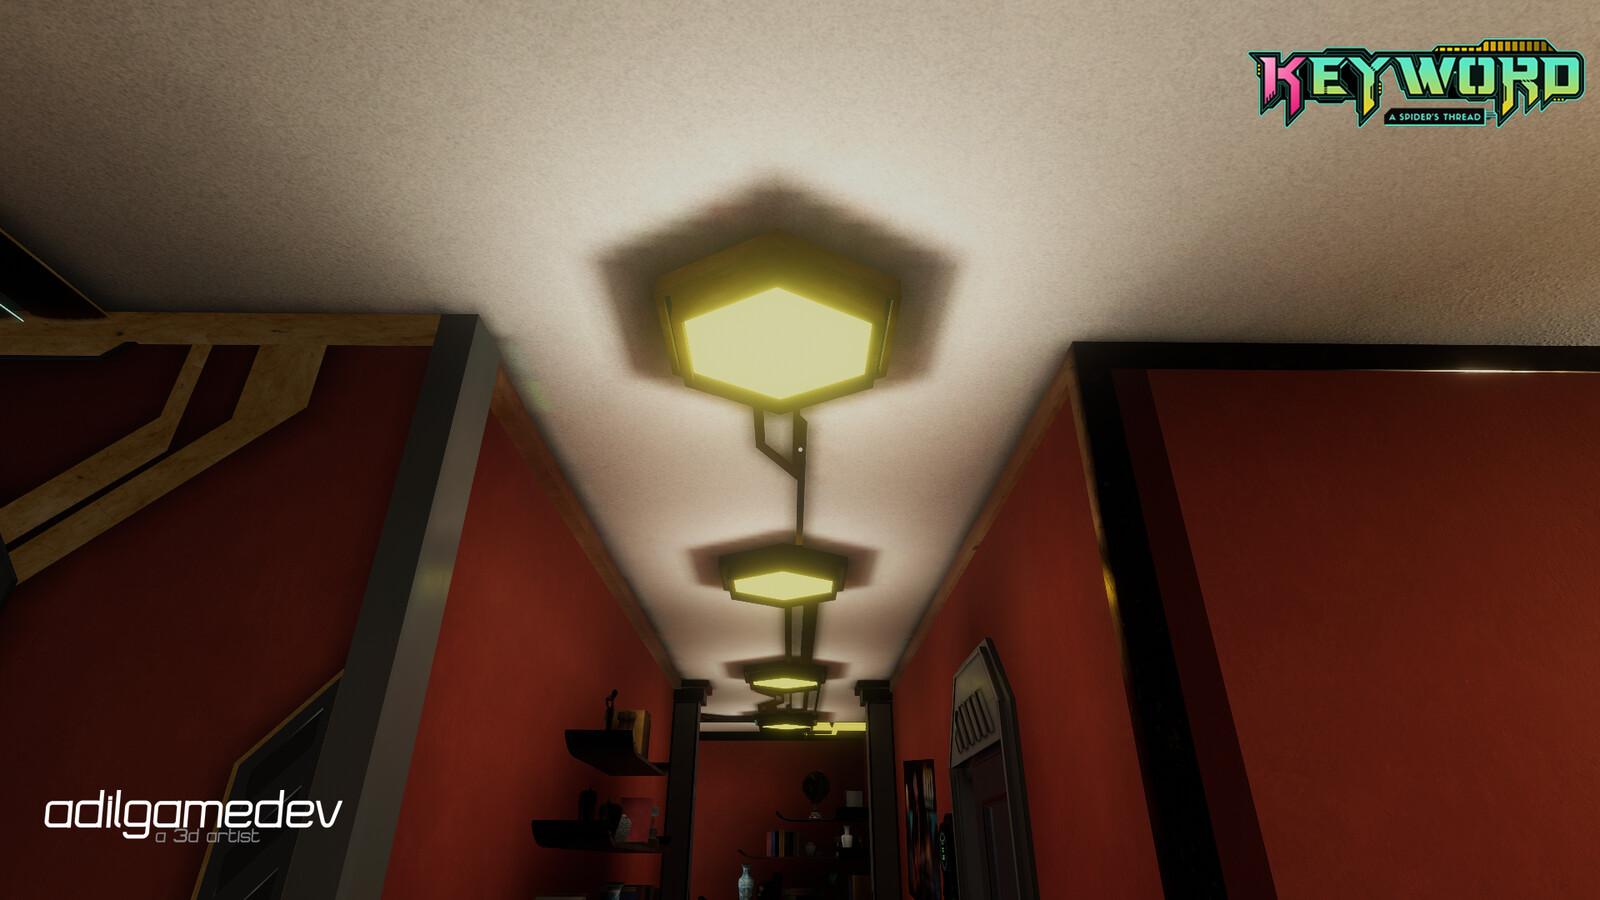 Ceiling light props